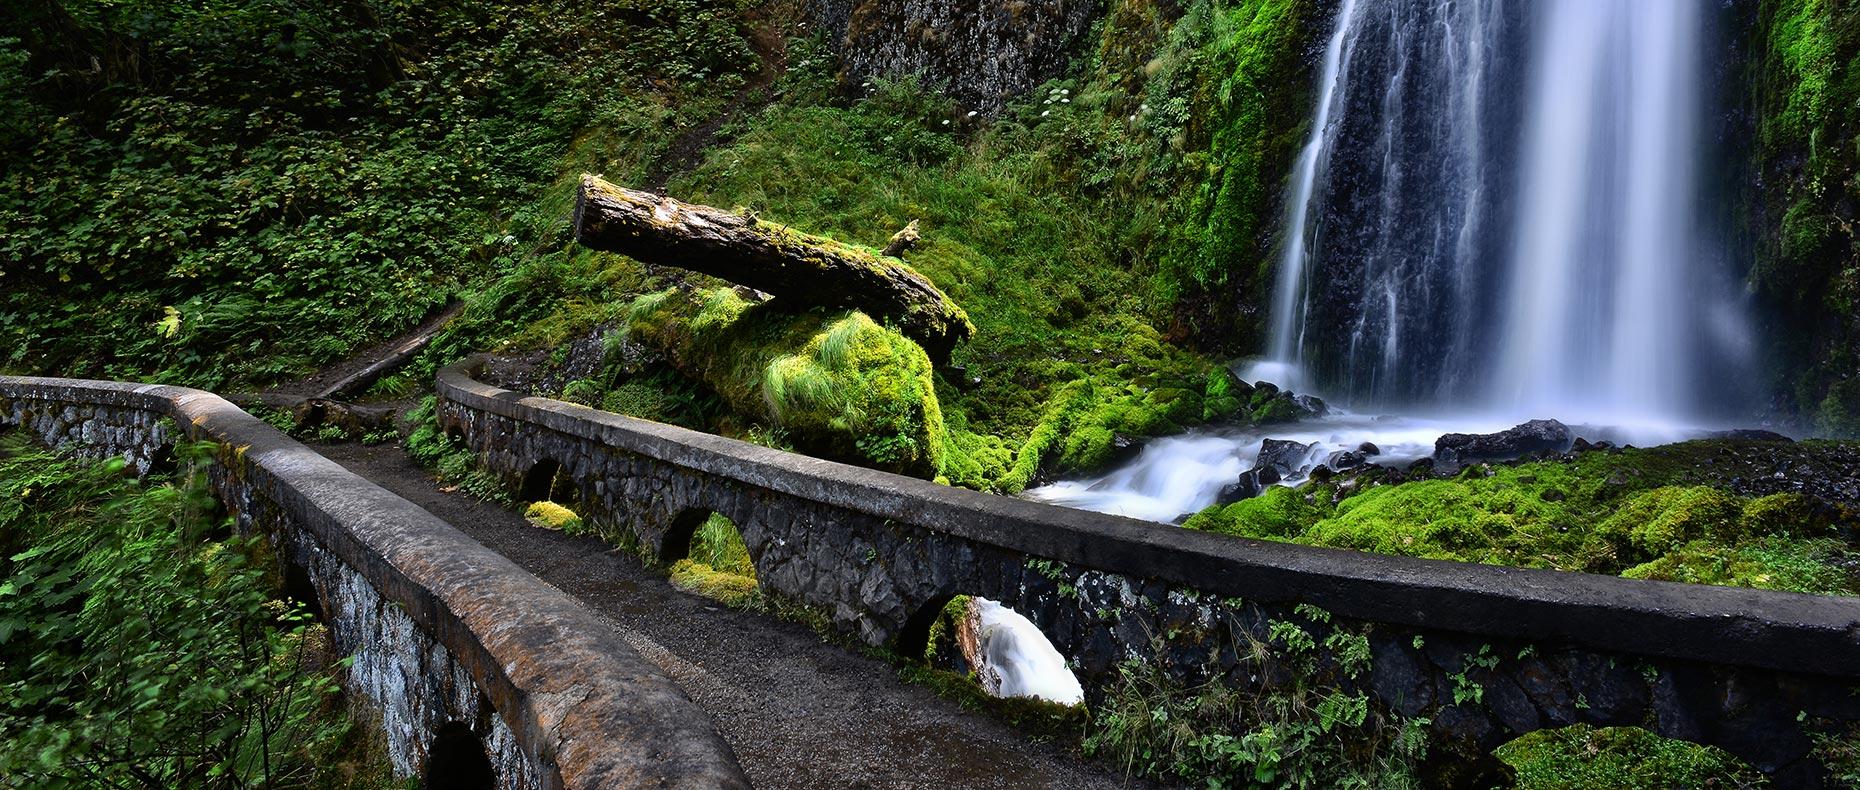 Lane_Peters_Multimedia_Columbia-River-Gorge.jpg